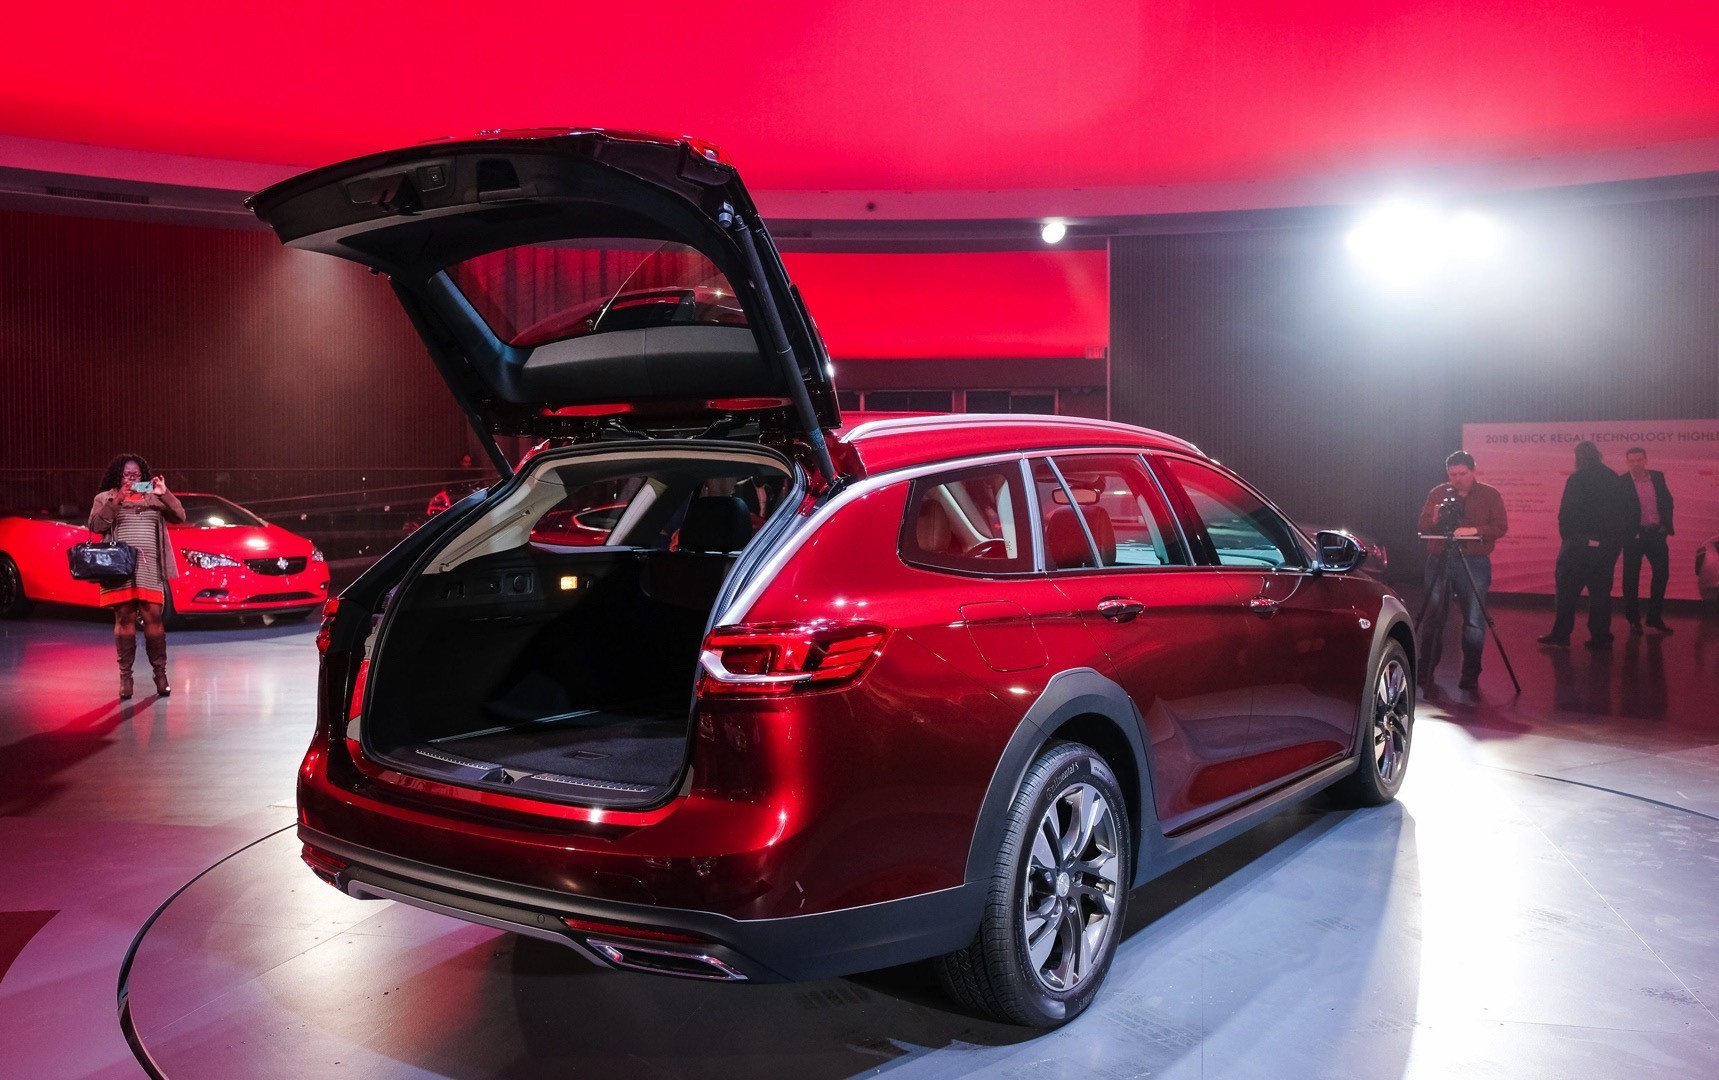 Buick Introduces 2018 Regal Sportback Sedan And 2018 Regal ...